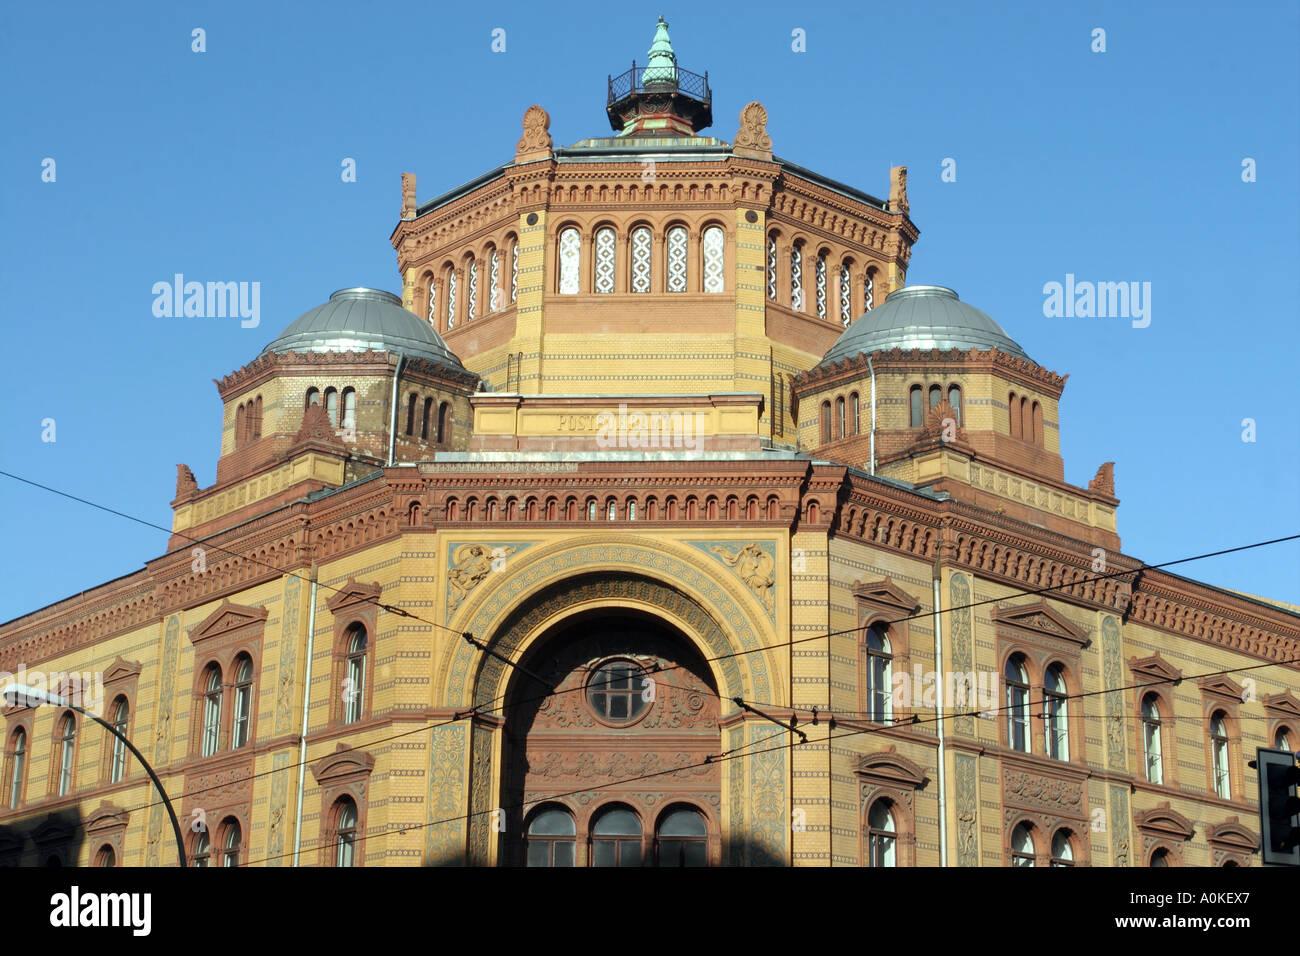 Postfuhramt - Postal Stagecoach Building, Berlin, Germany - Stock Image